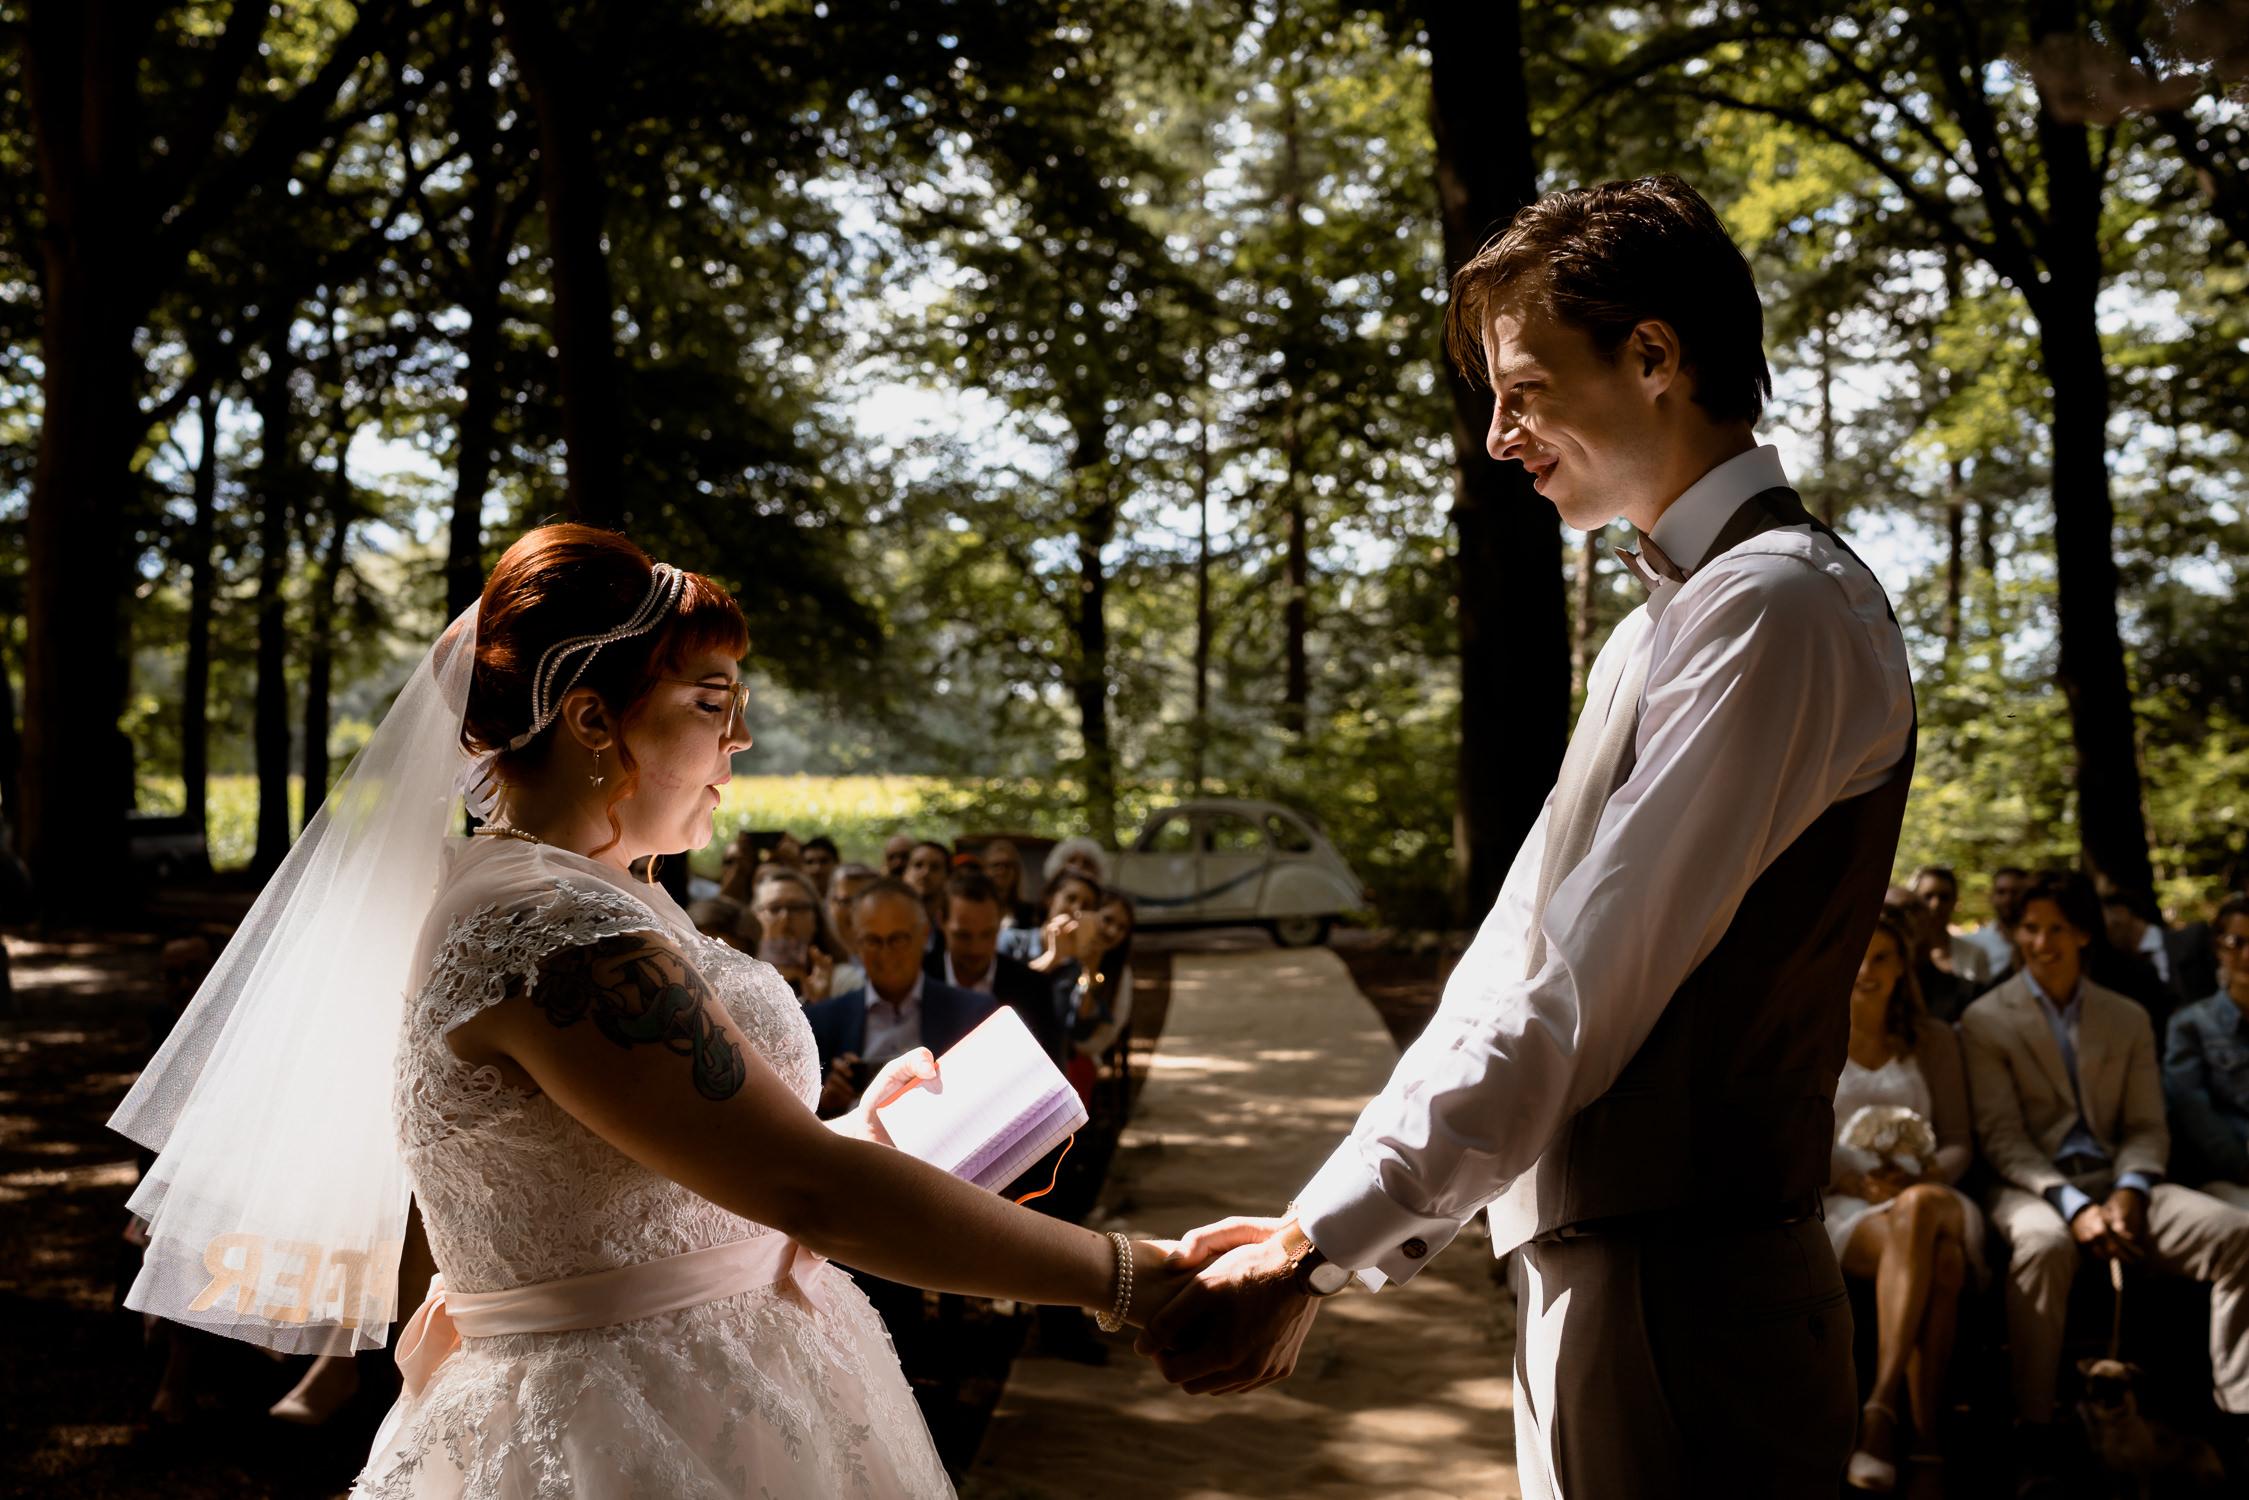 amsterdam-wedding-photographer-bruidsfotografie-trouwfotograaf-mark-hadden-Lucie-Luuk-113.jpg